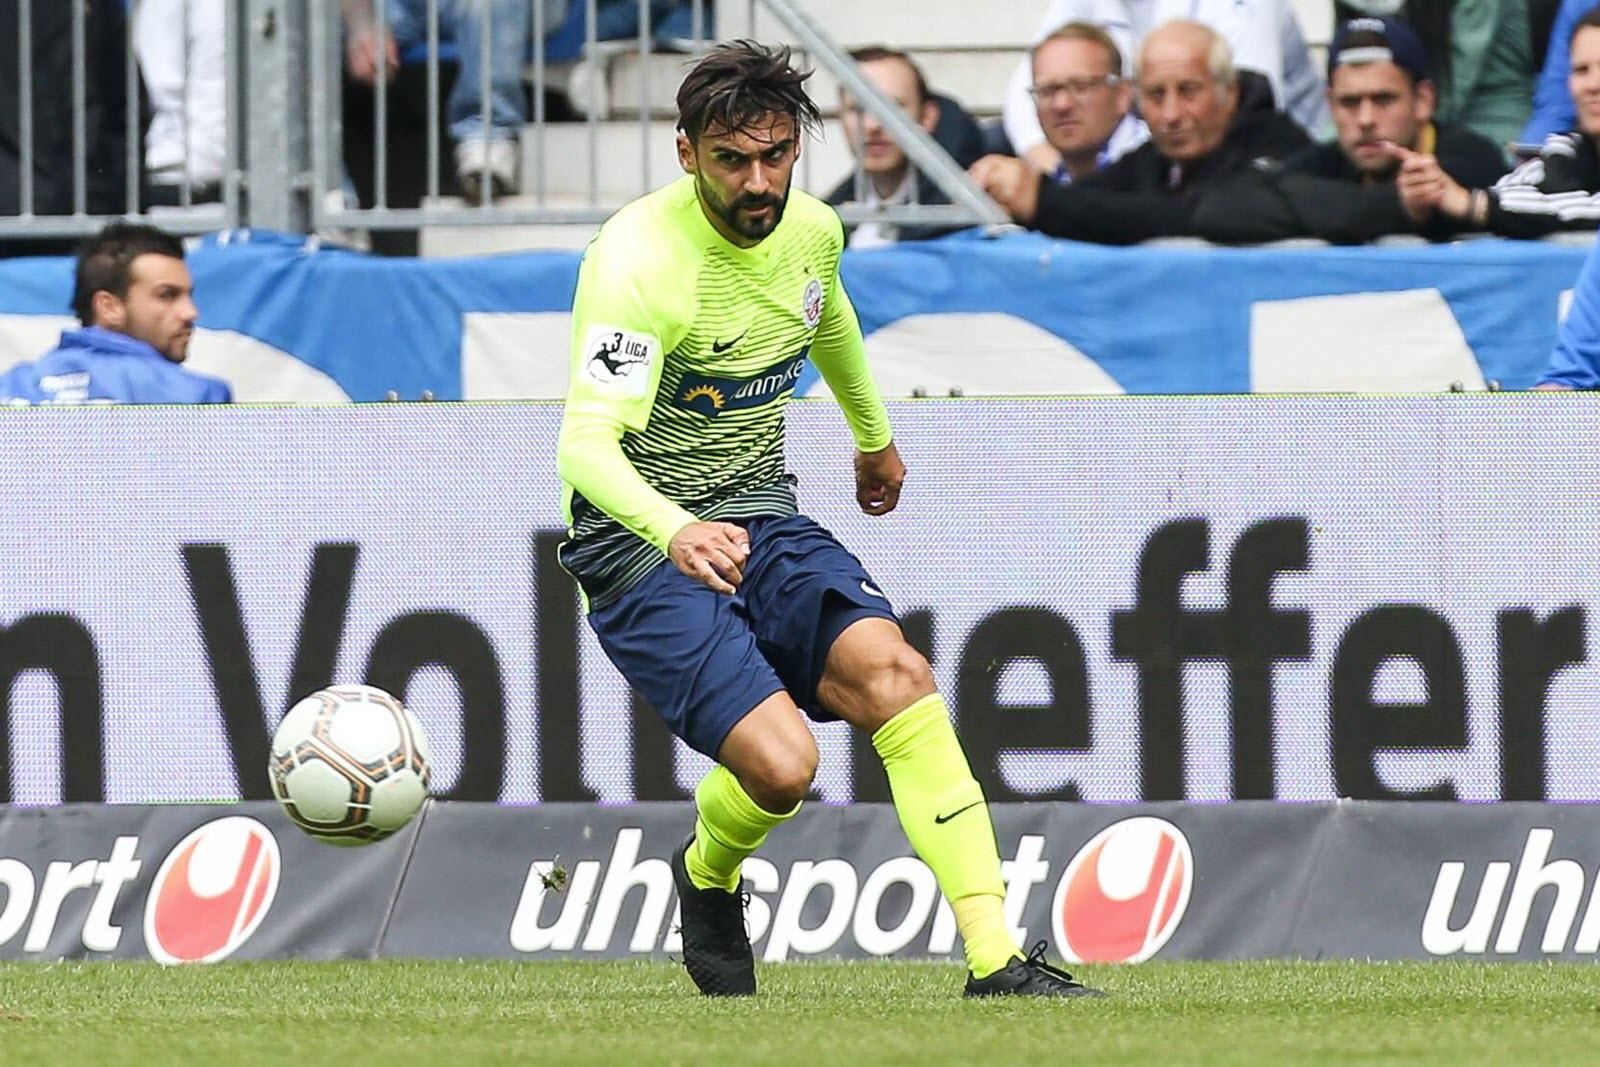 Selcuk Alibaz am Ball für Hansa Rostock.